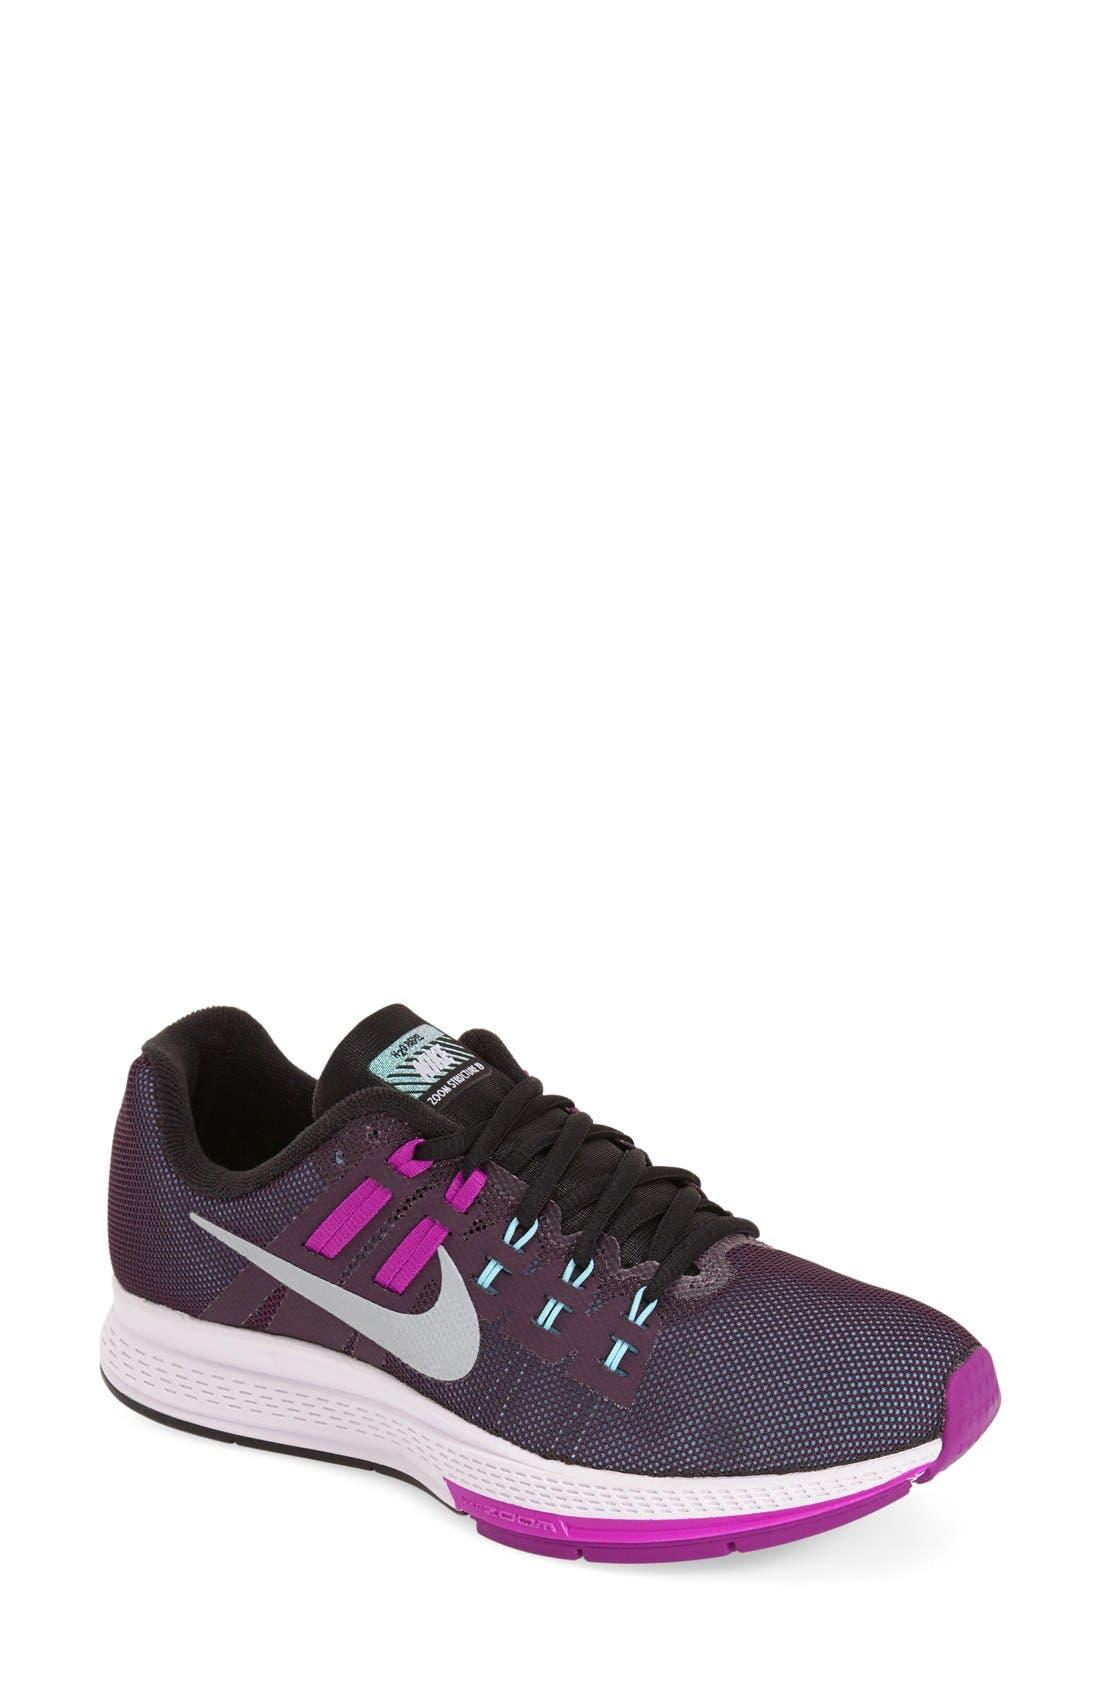 Main Image - Nike 'Air Zoom Structure 19' Running Shoe (Women)